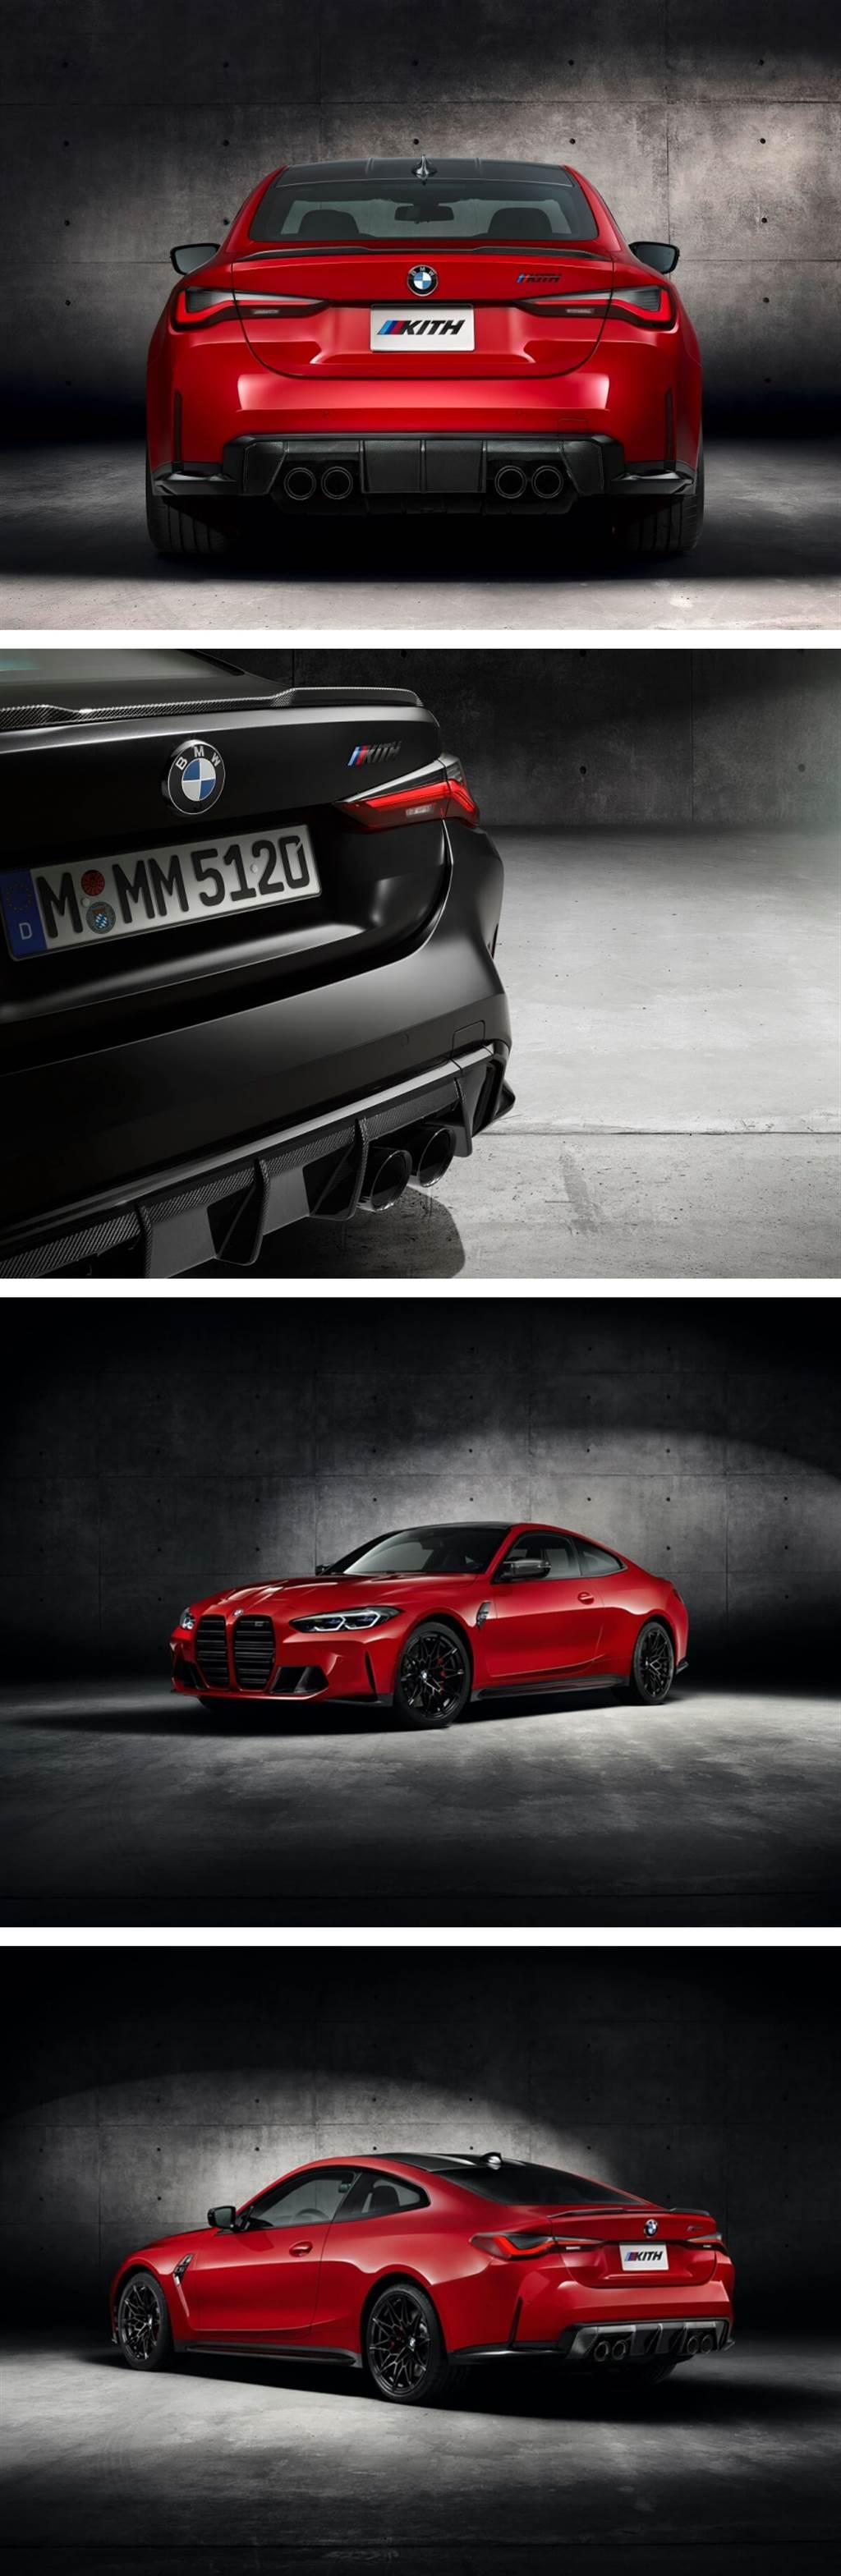 BMW與紐約潮牌KITH聯名推出限量版M4 Competition,並已開始接受訂購 聯名服飾精品也同步發售